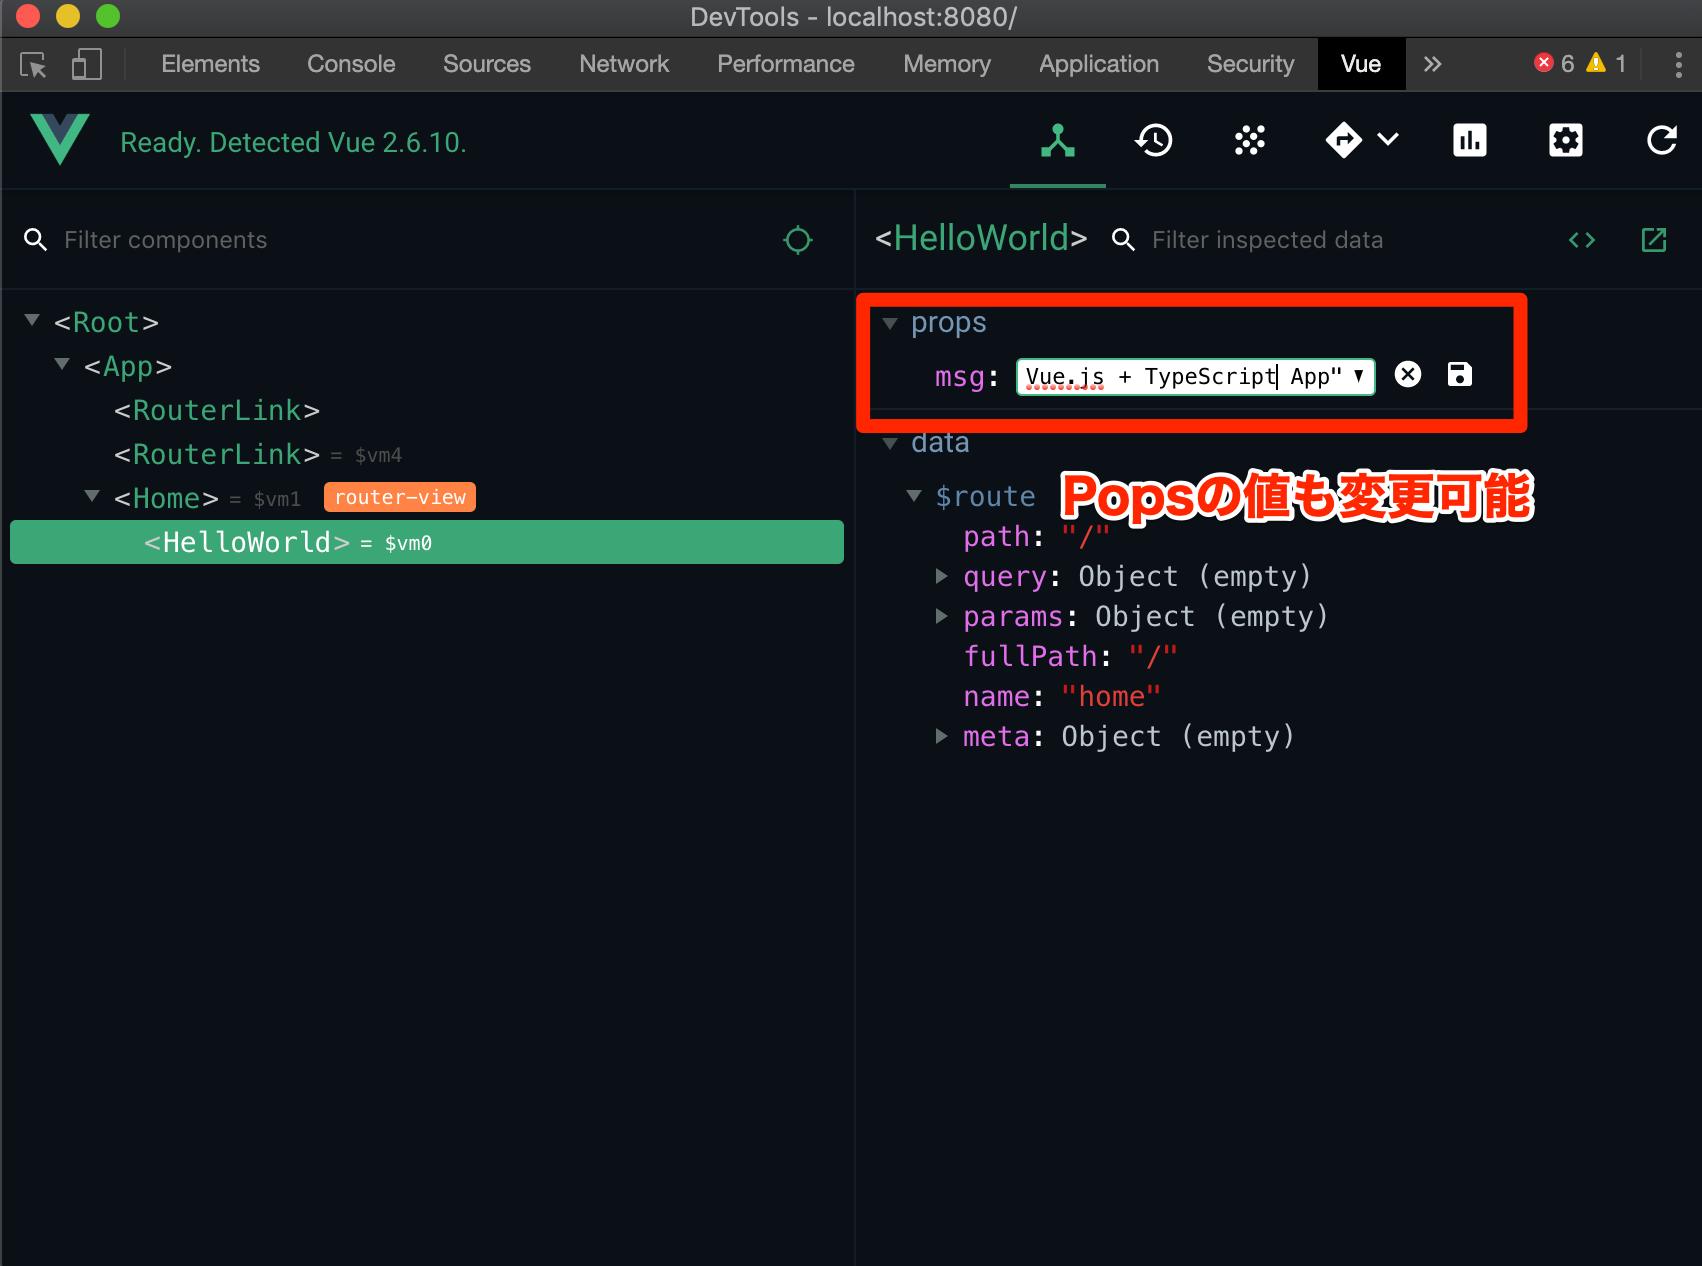 DevTools_-_localhost_8080_.png